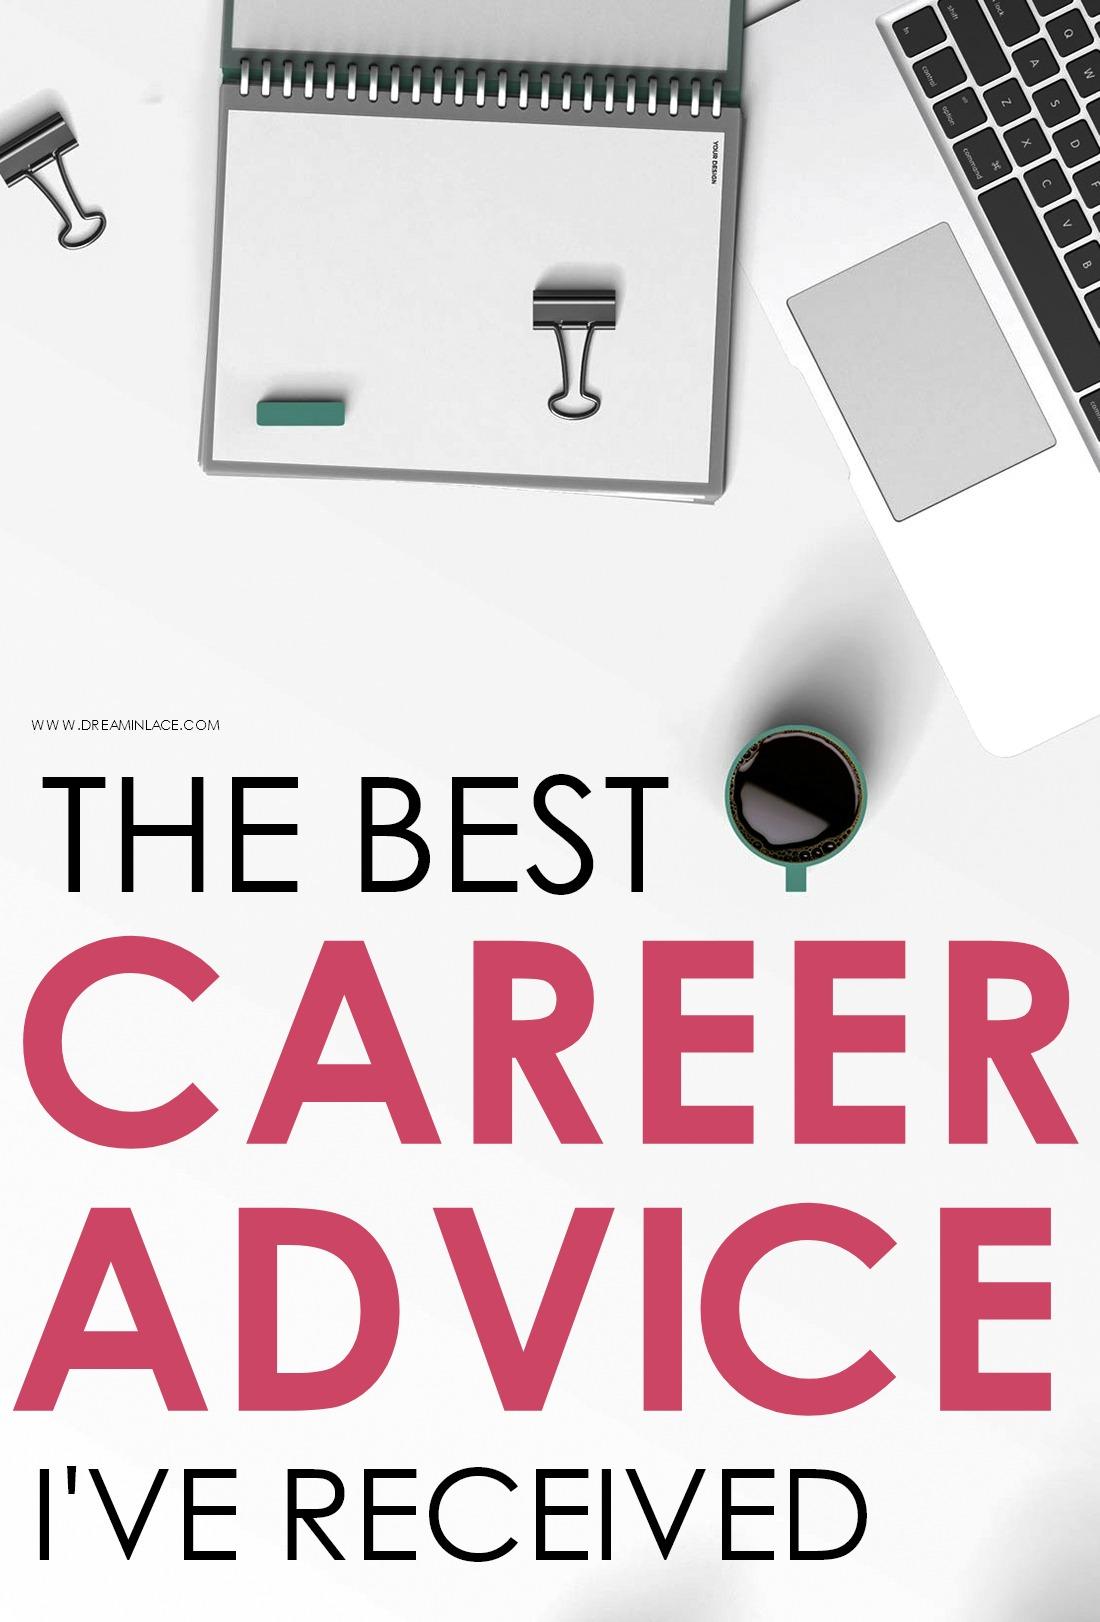 The Best Career Advice I've Ever Received I DreaminLace.com #motivation